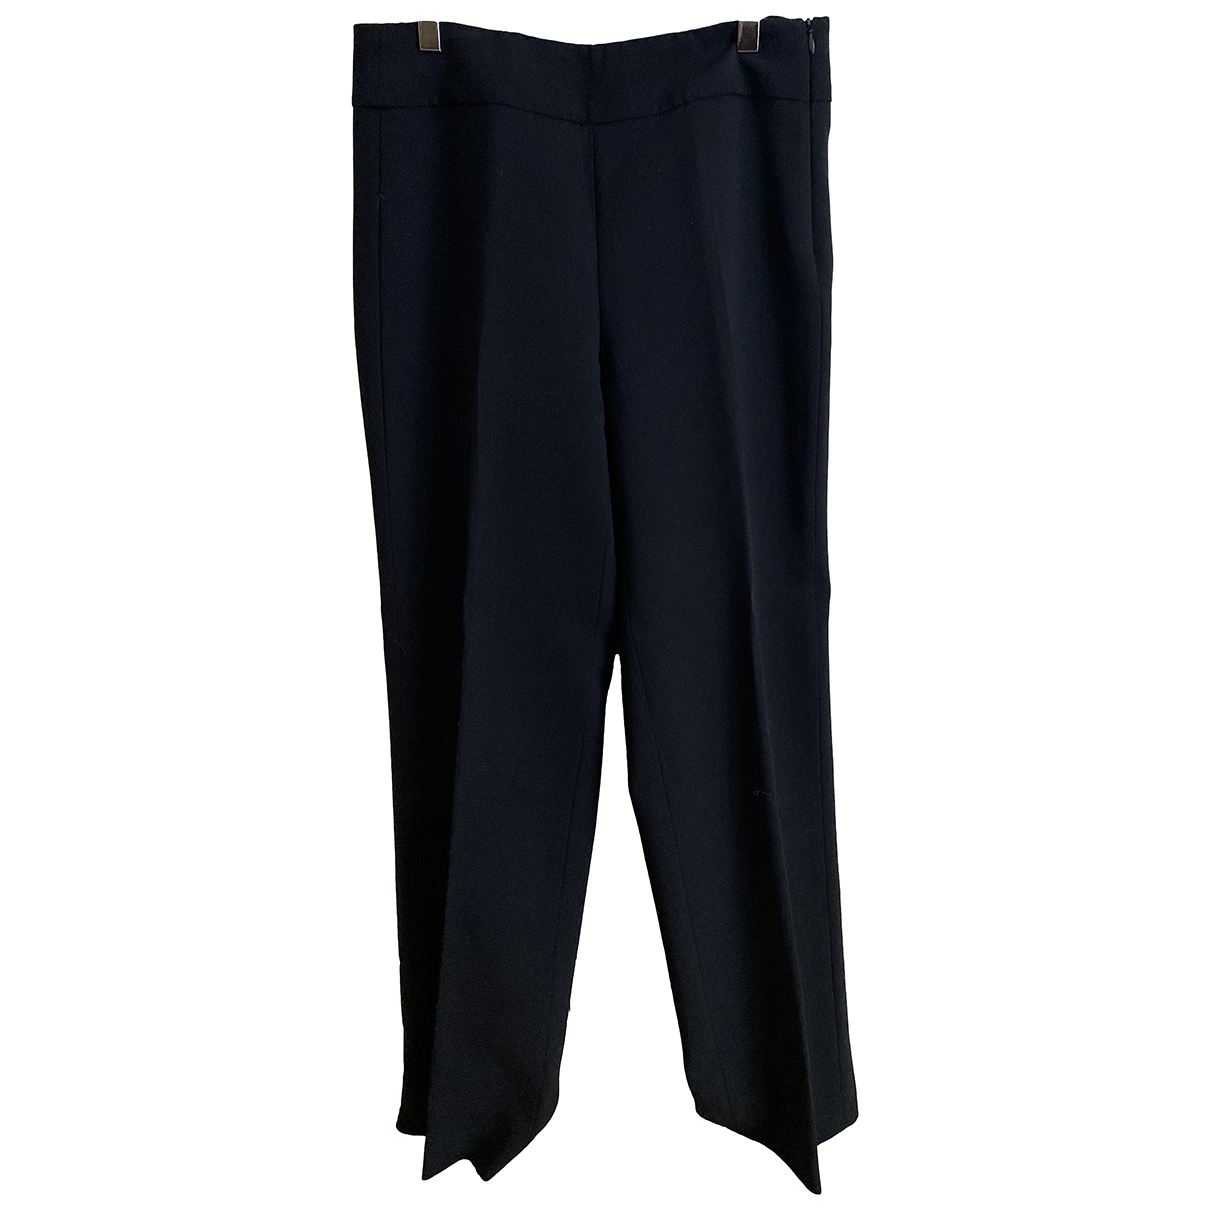 Max Mara \N Black Wool Trousers for Women 42 IT